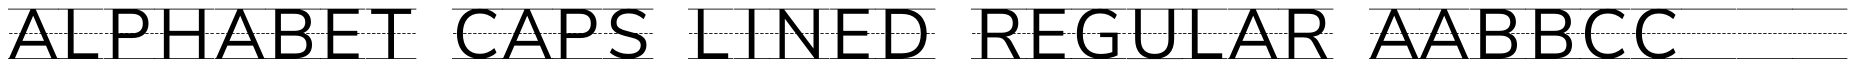 Alphabet Caps Lined